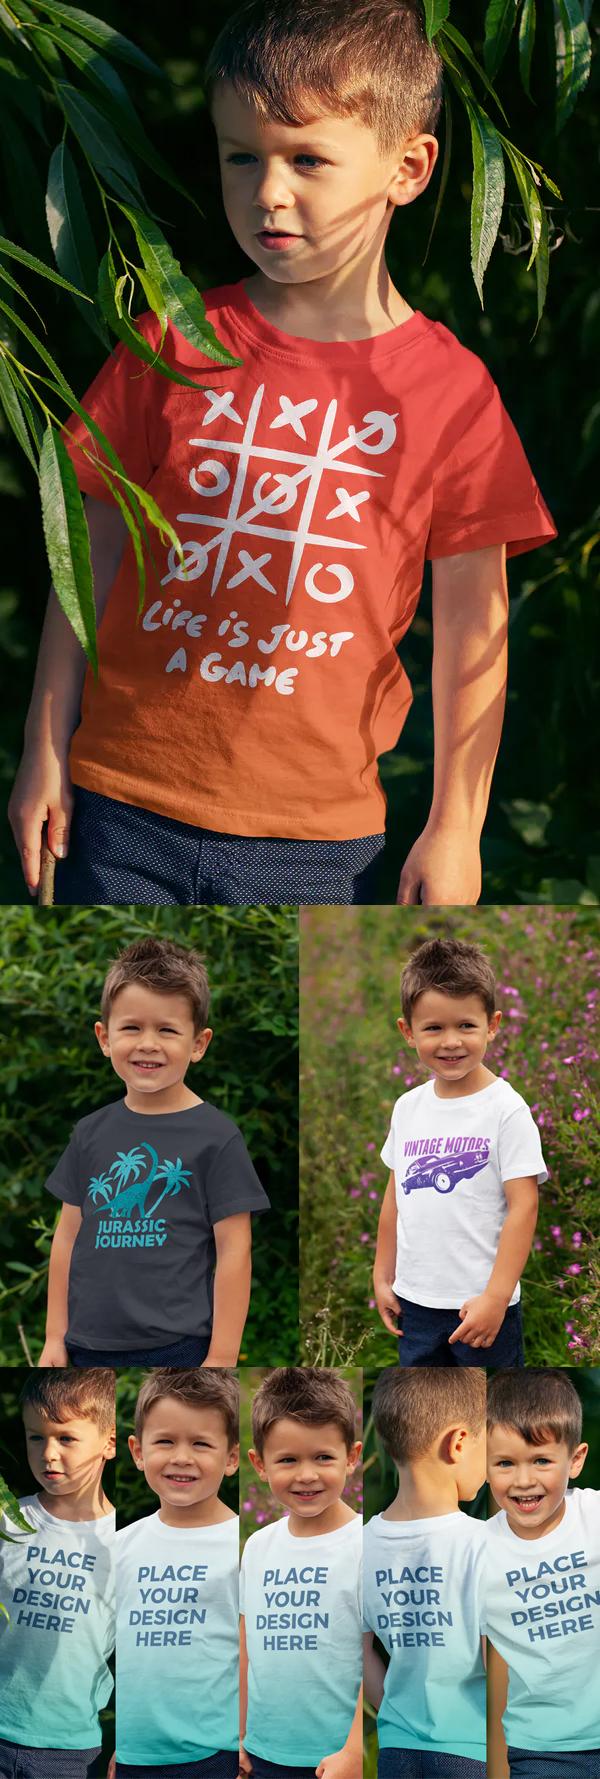 Boys / Kids T-shirt Mockup